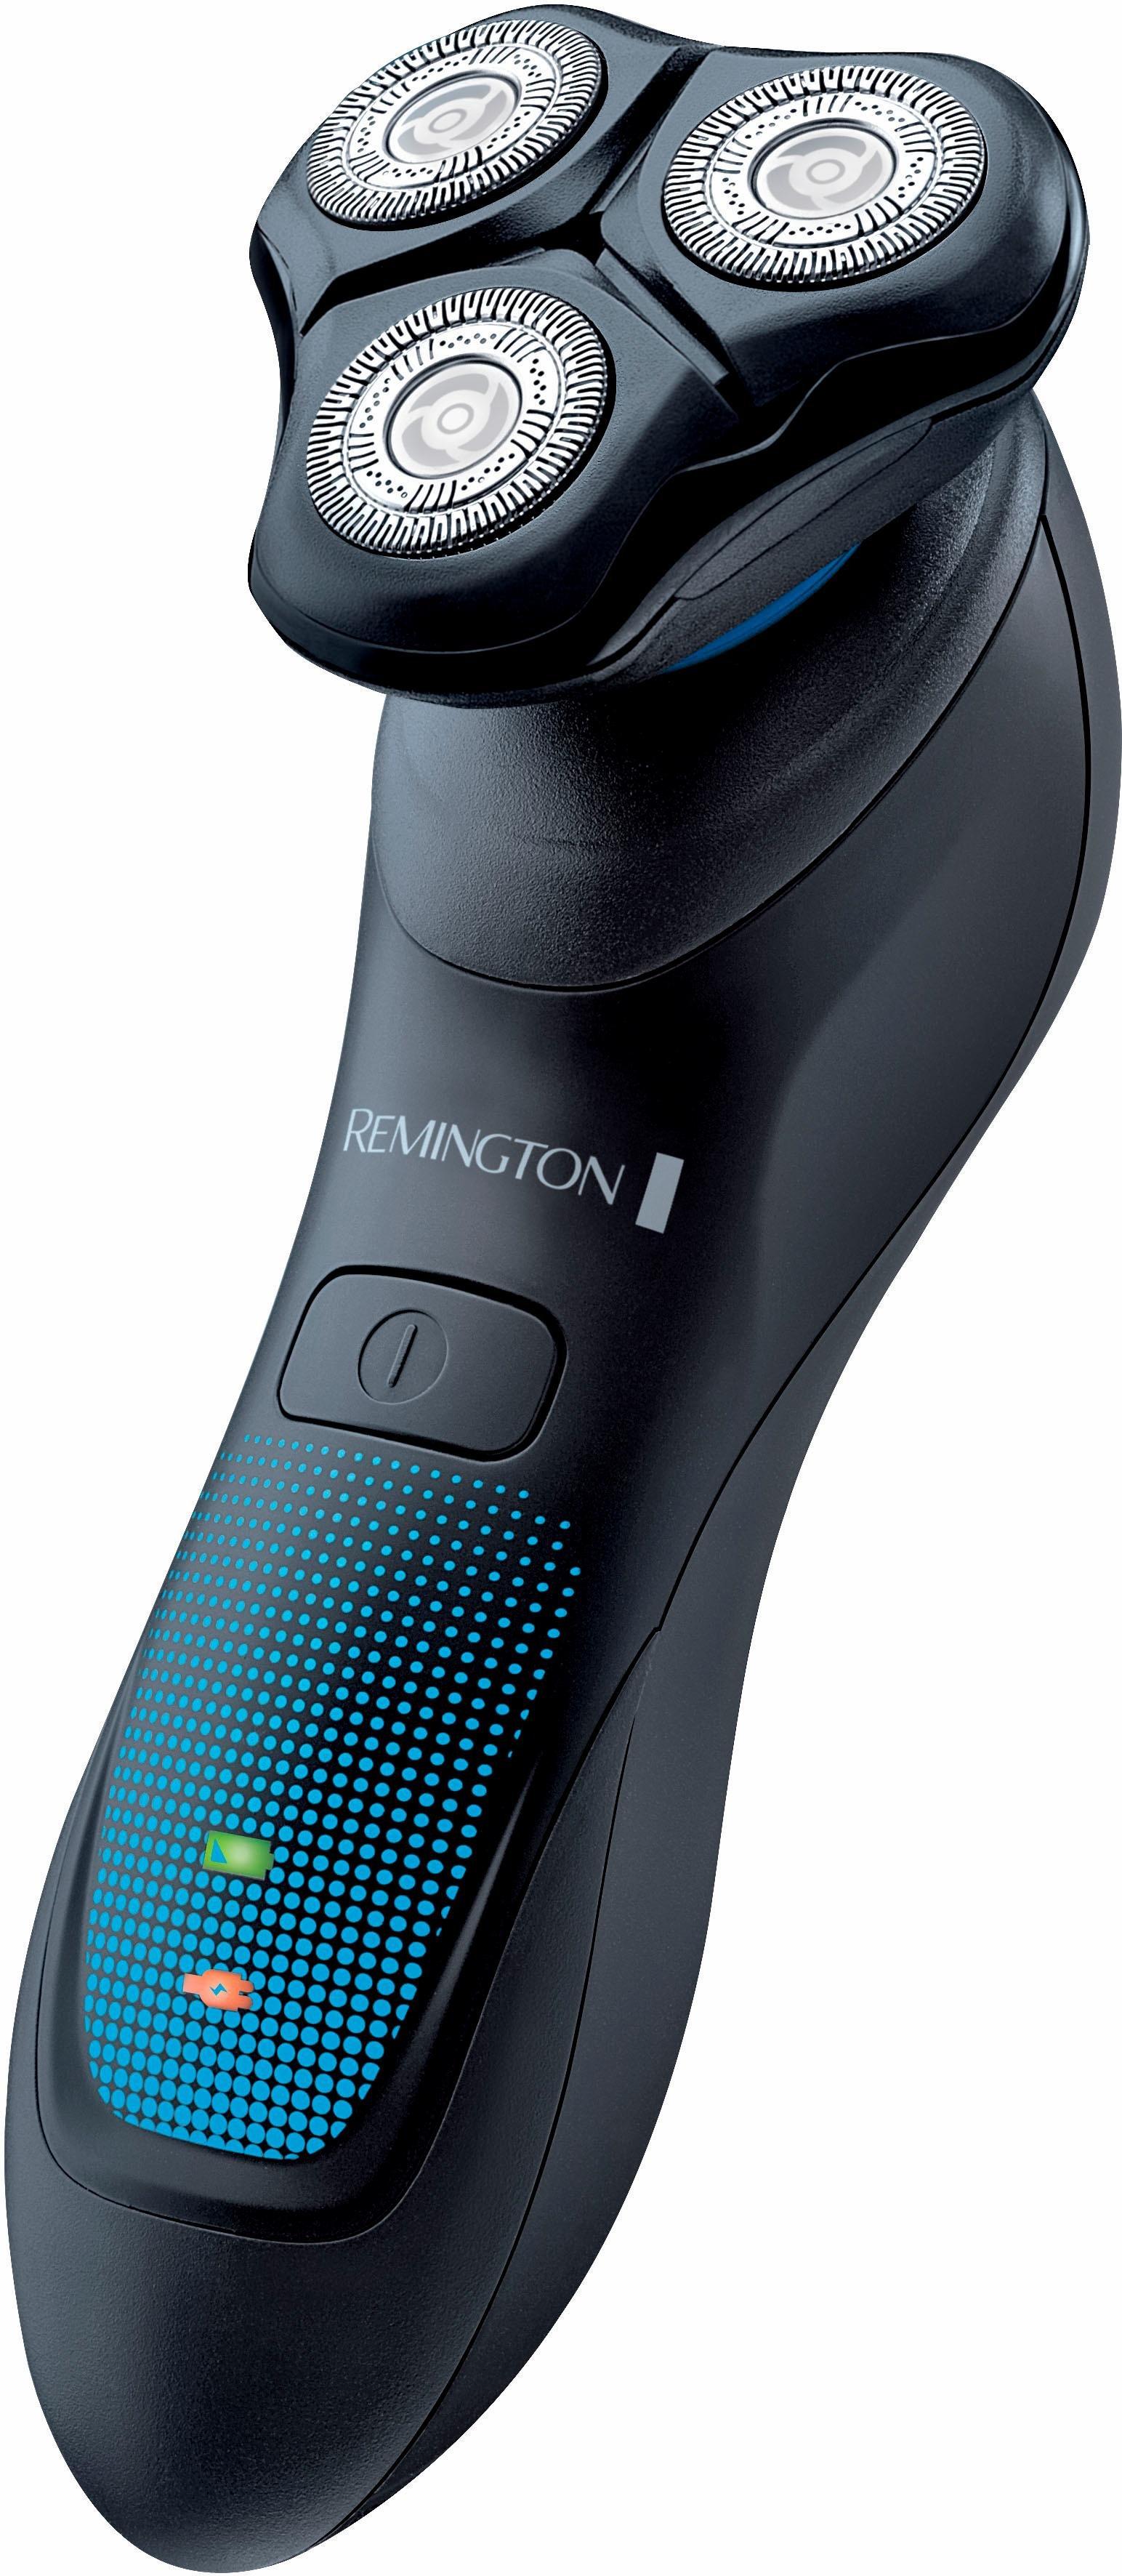 Remington Elektrorasierer HyperFlex Aqua XR1430 Langhaartrimmer